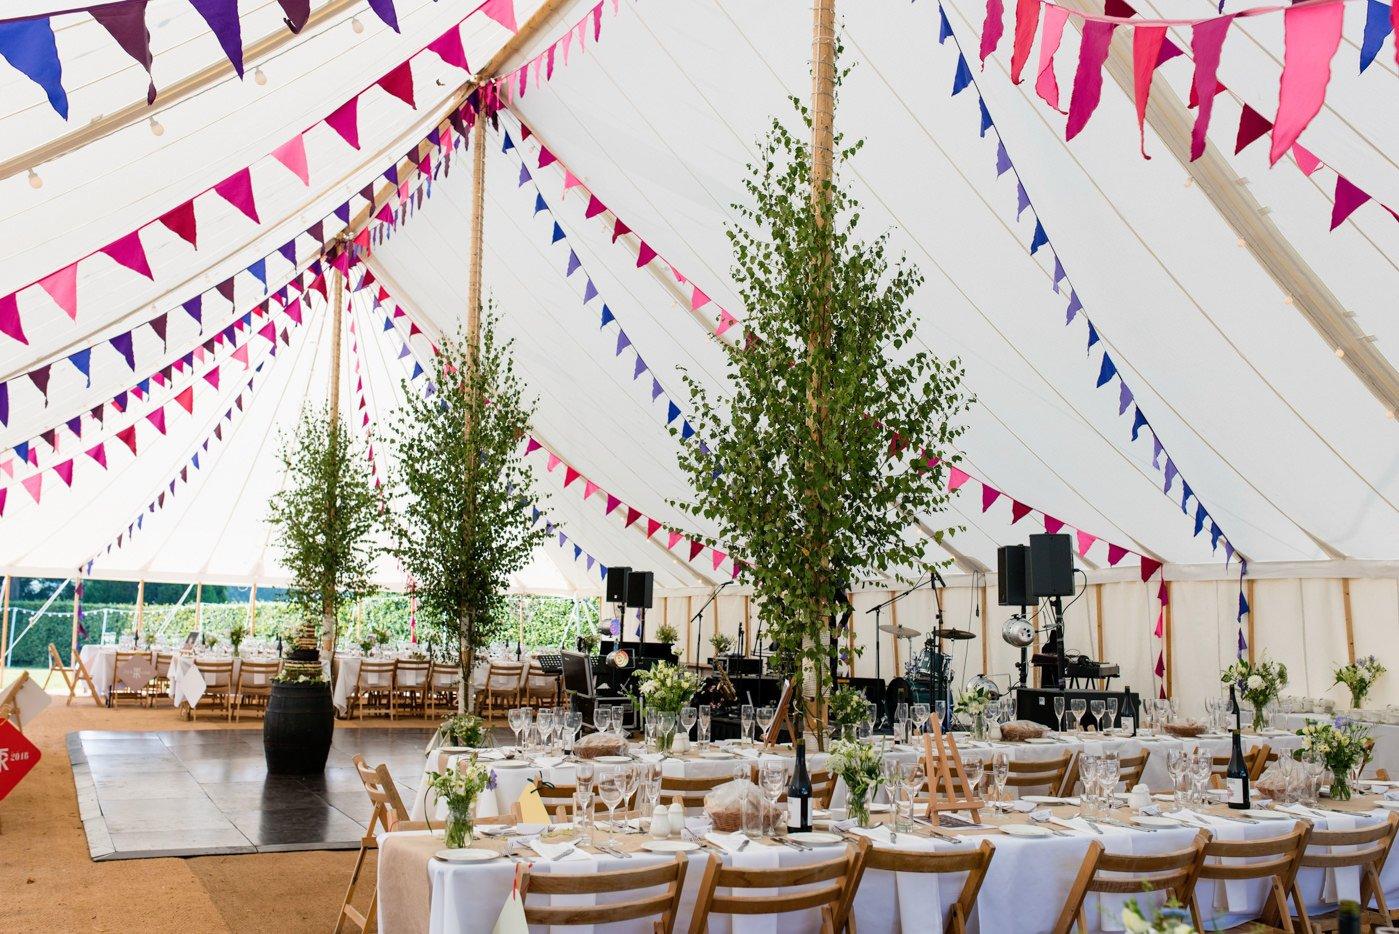 bignor-park-wedding-photography-robyn-and-tom-64